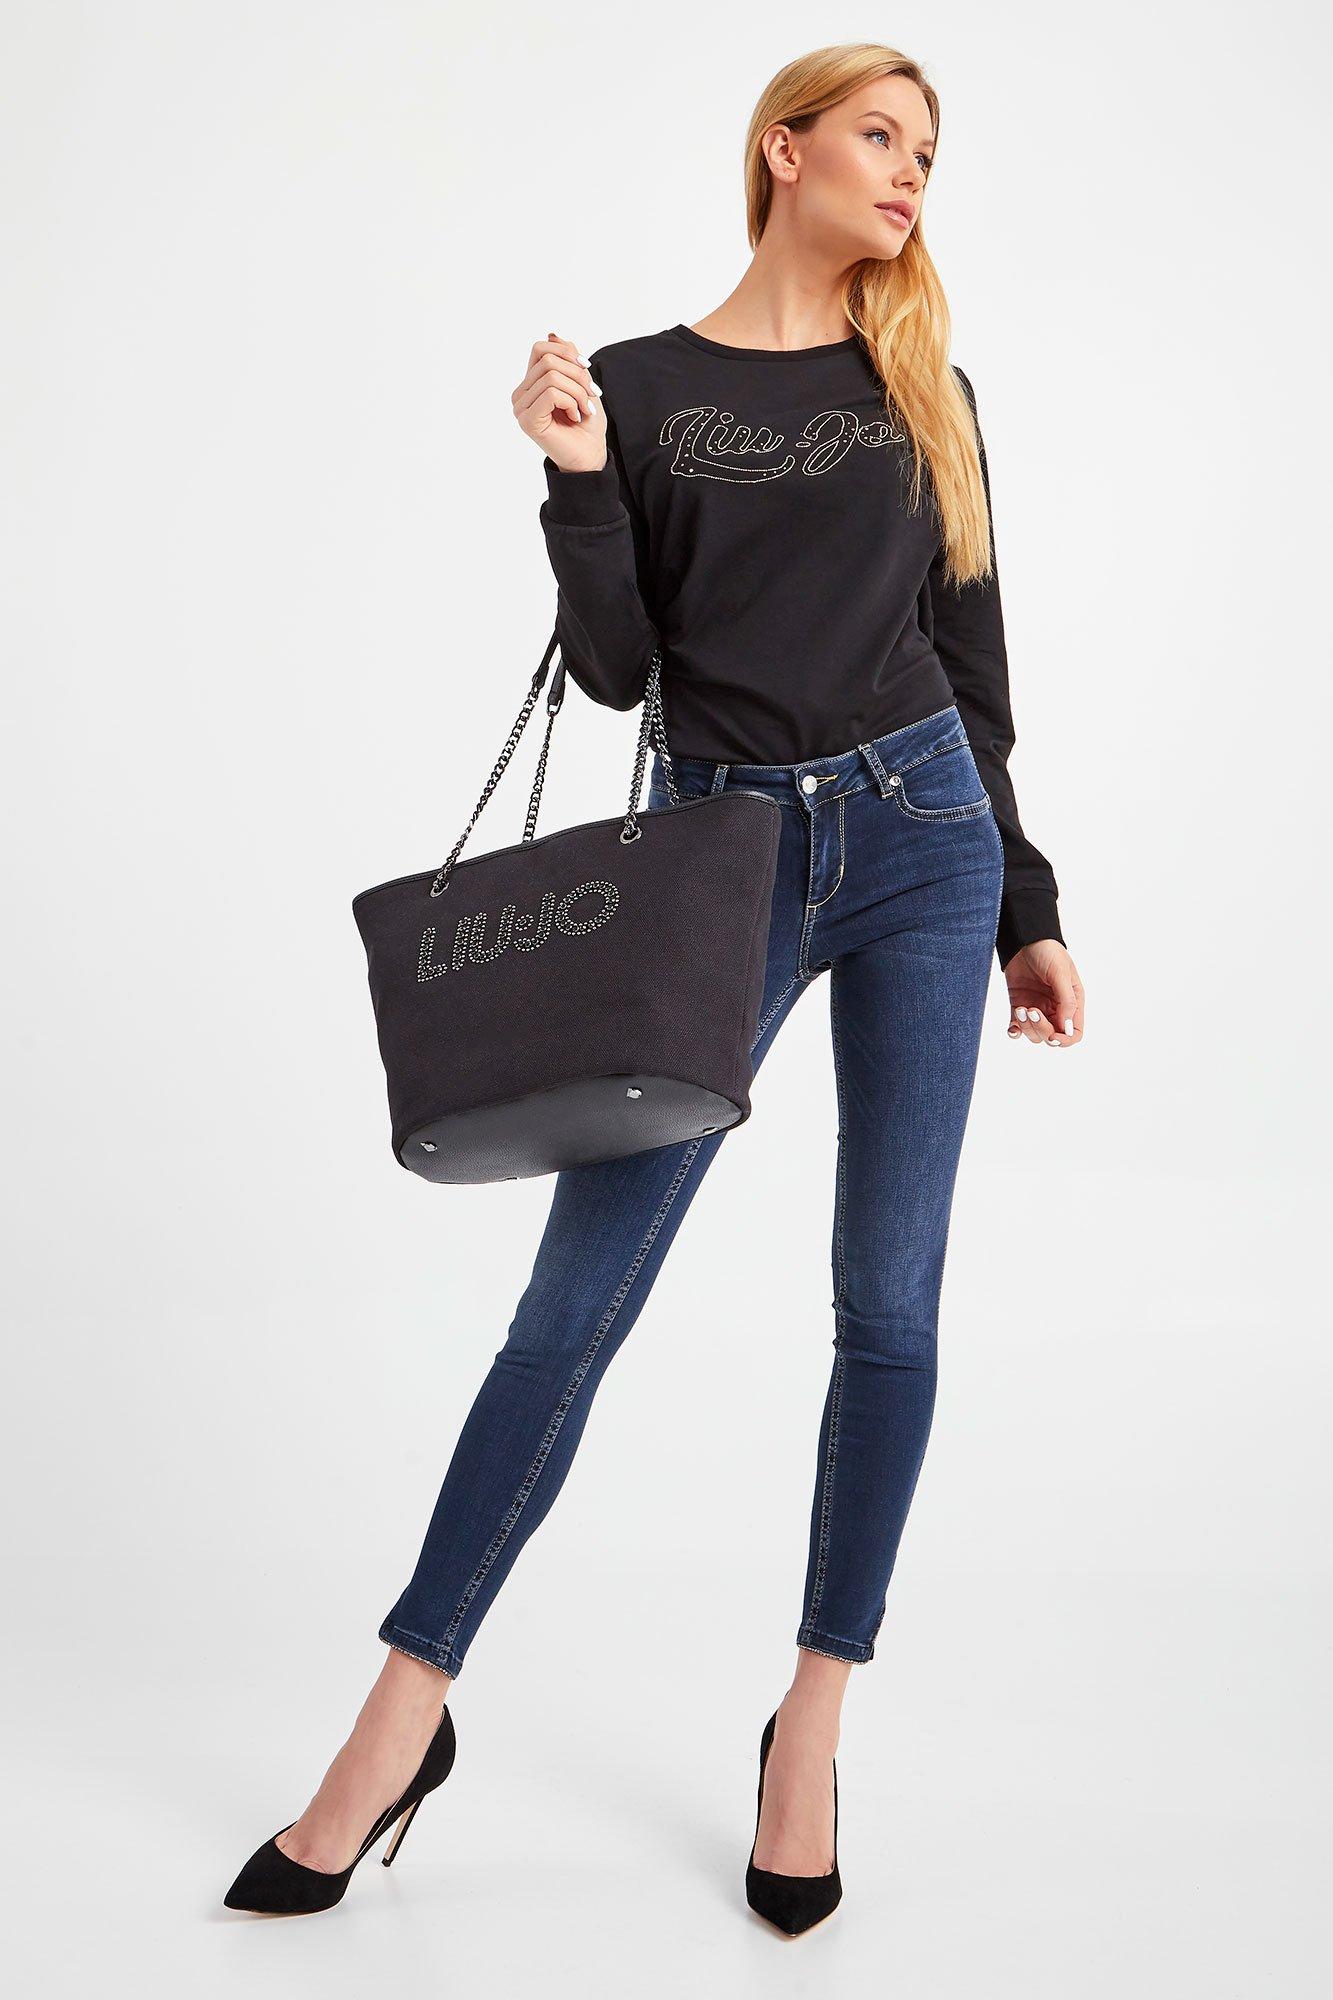 jeans strass bottom up liu jo LIU JO | Jeans | UA1012D418878158